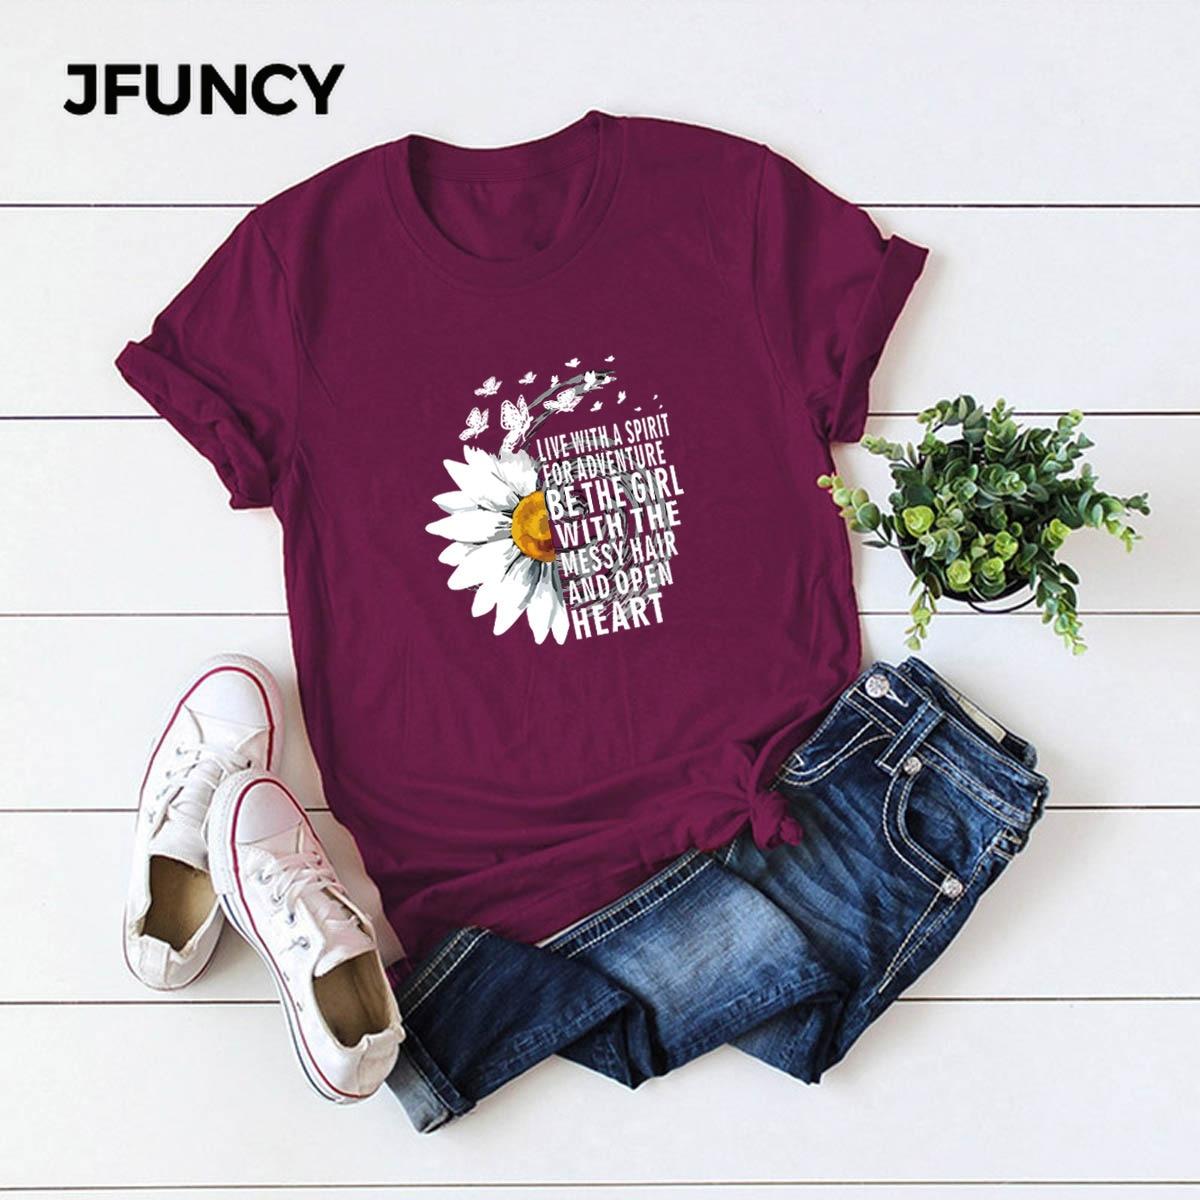 JFUNCY 2020 새 여름 코튼 여성 티셔츠 크리 에이 티브 국화 영감 편지 인쇄 T 셔츠 플러스 사이즈 Mujer Tee Tops/JFUNCY 2020 새 여름 코튼 여성 티셔츠 크리 에이 티브 국화 영감 편지 인쇄 T 셔츠 플러스 사이즈